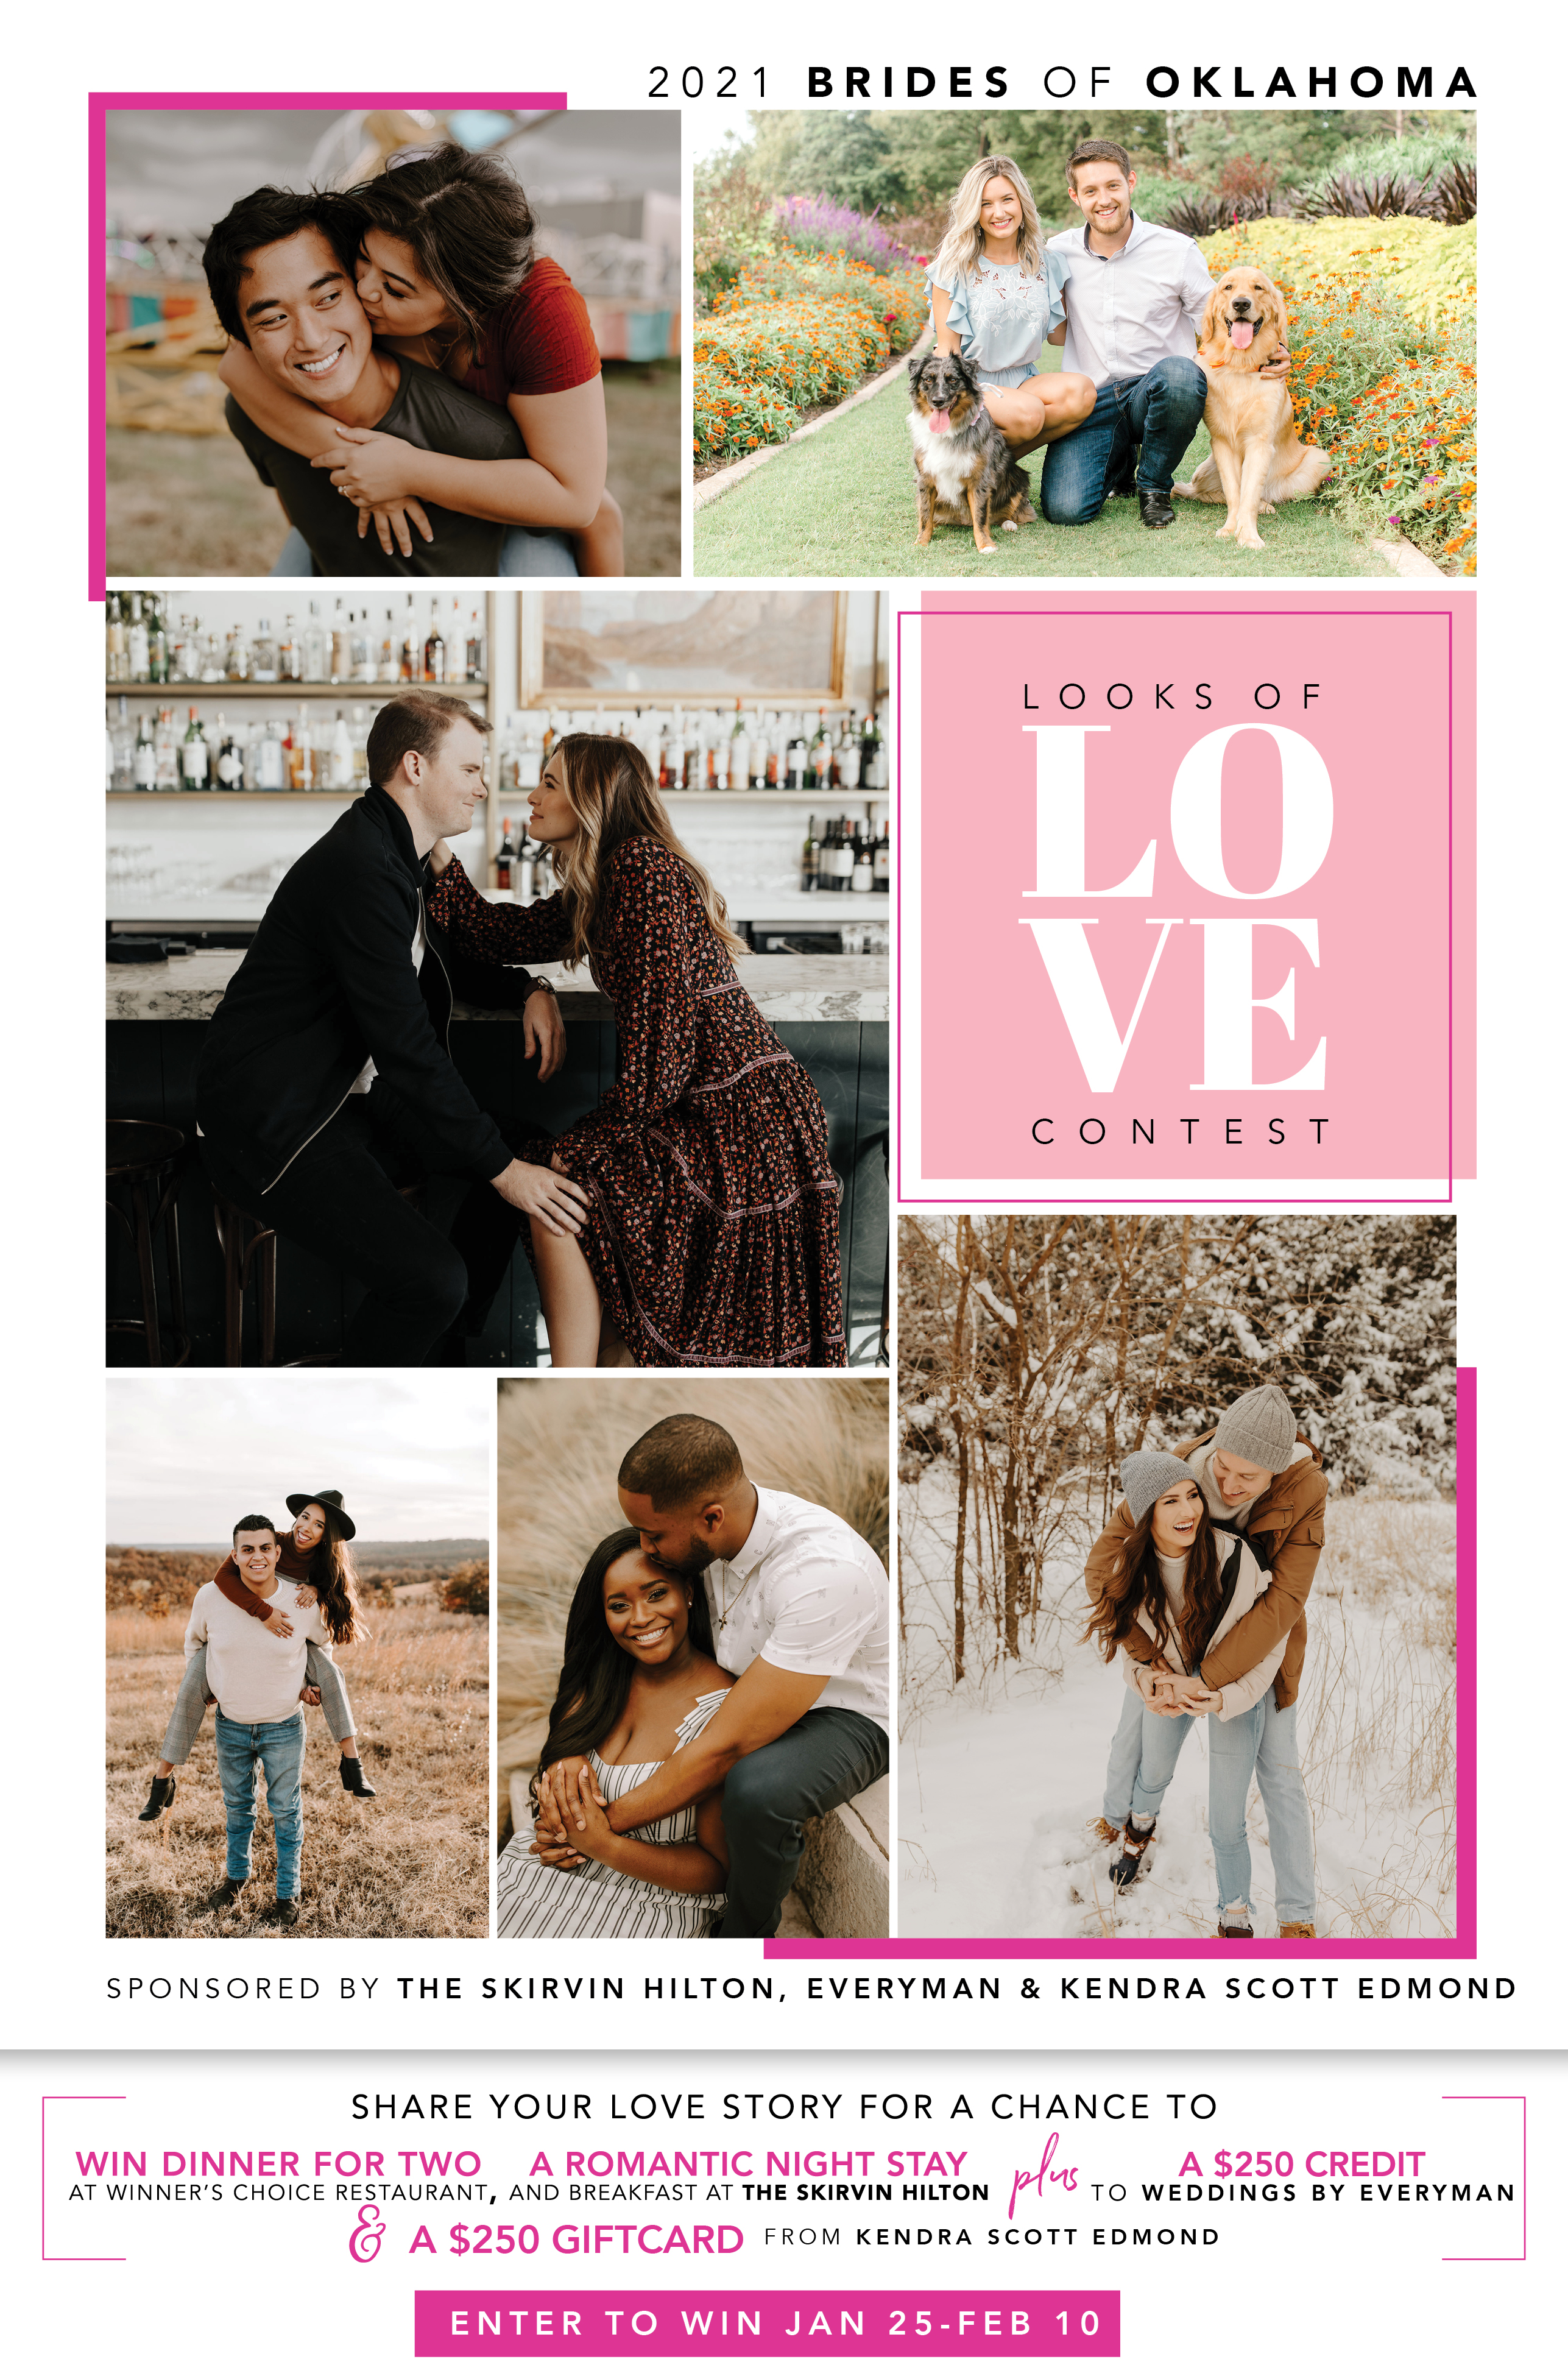 brides of Oklahoma 2021 looks of love contest